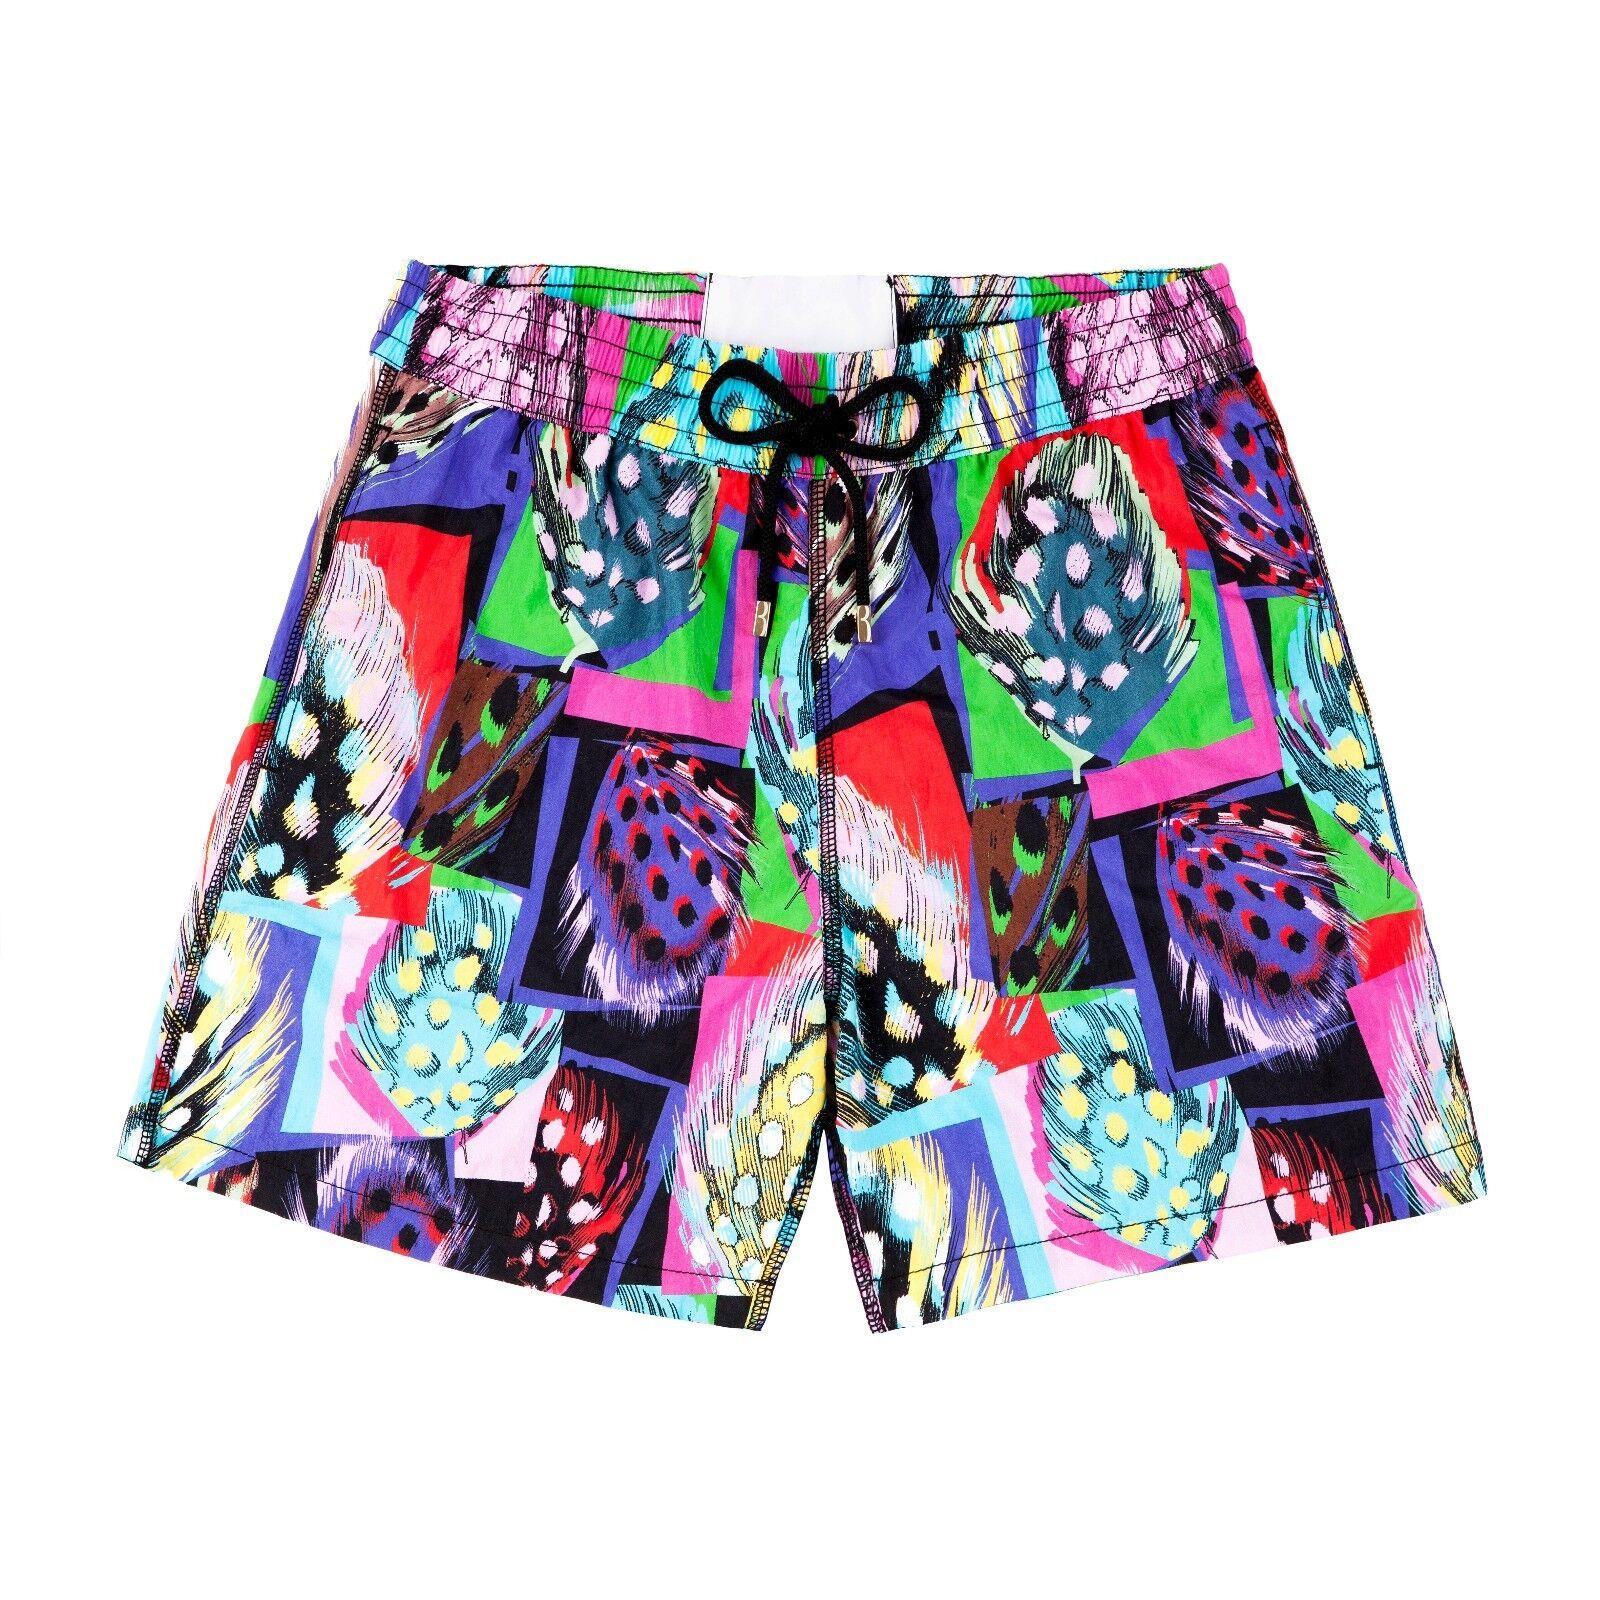 Billionaire Couture Men's Patterned Swimming Shorts Short Length, size S, L